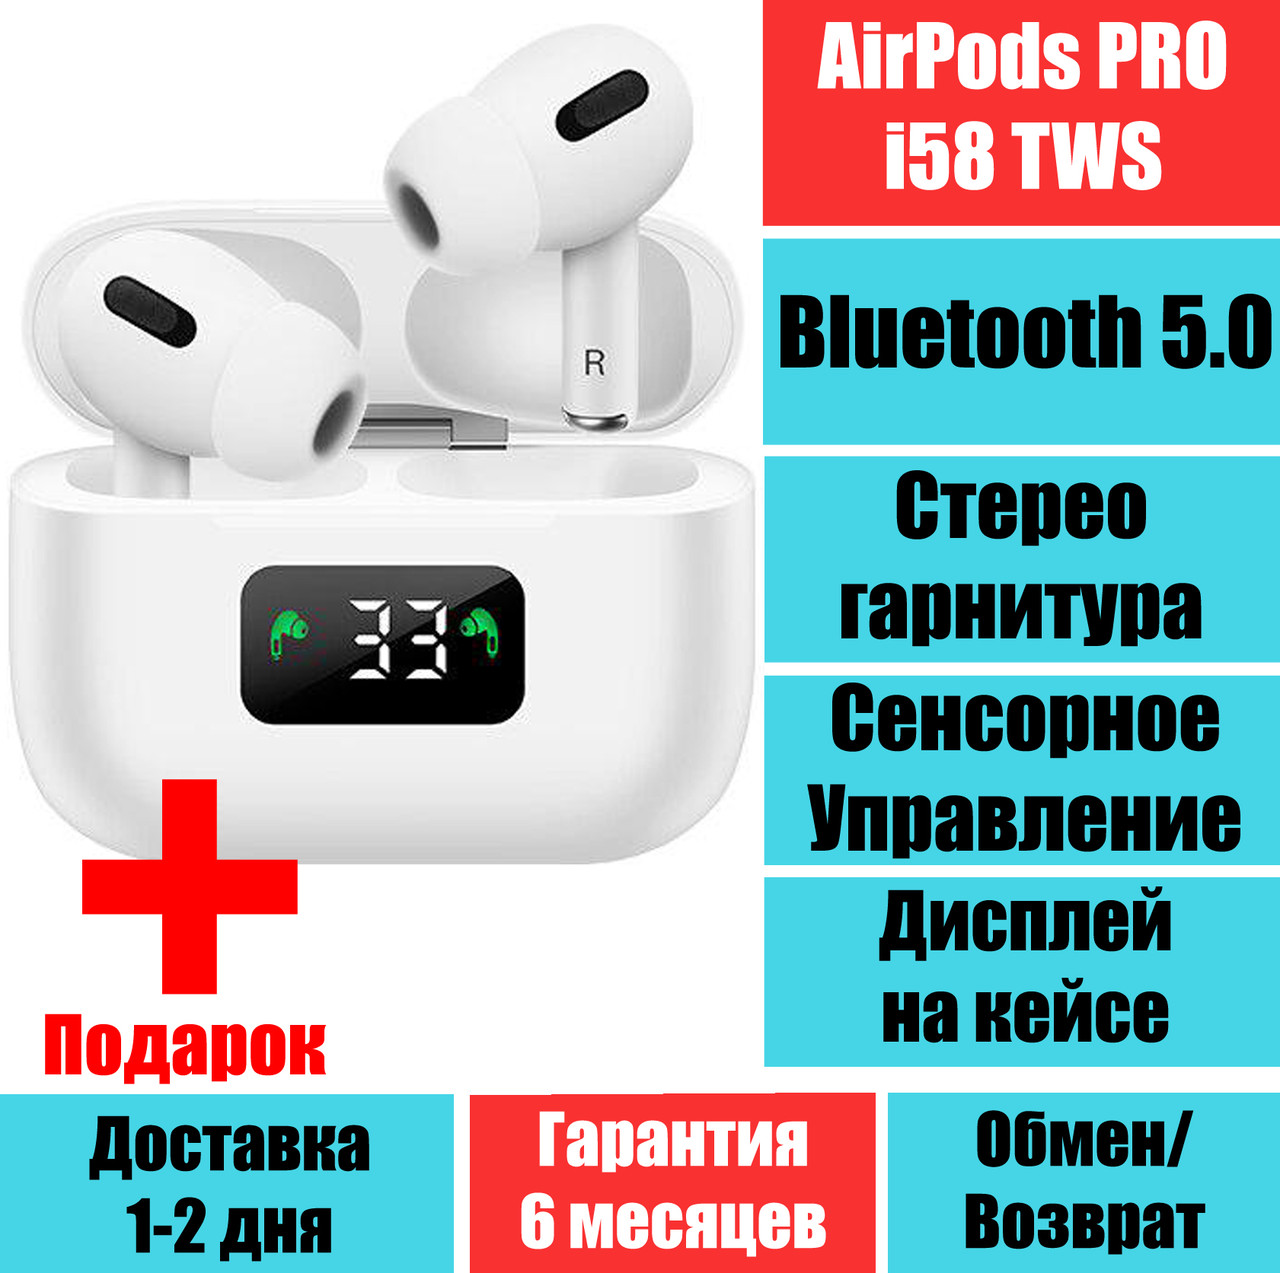 Наушники Аирподс Про i58 TWS APRO3 LCD Sensor Bluetooth 5.0 Стерео гарнитура